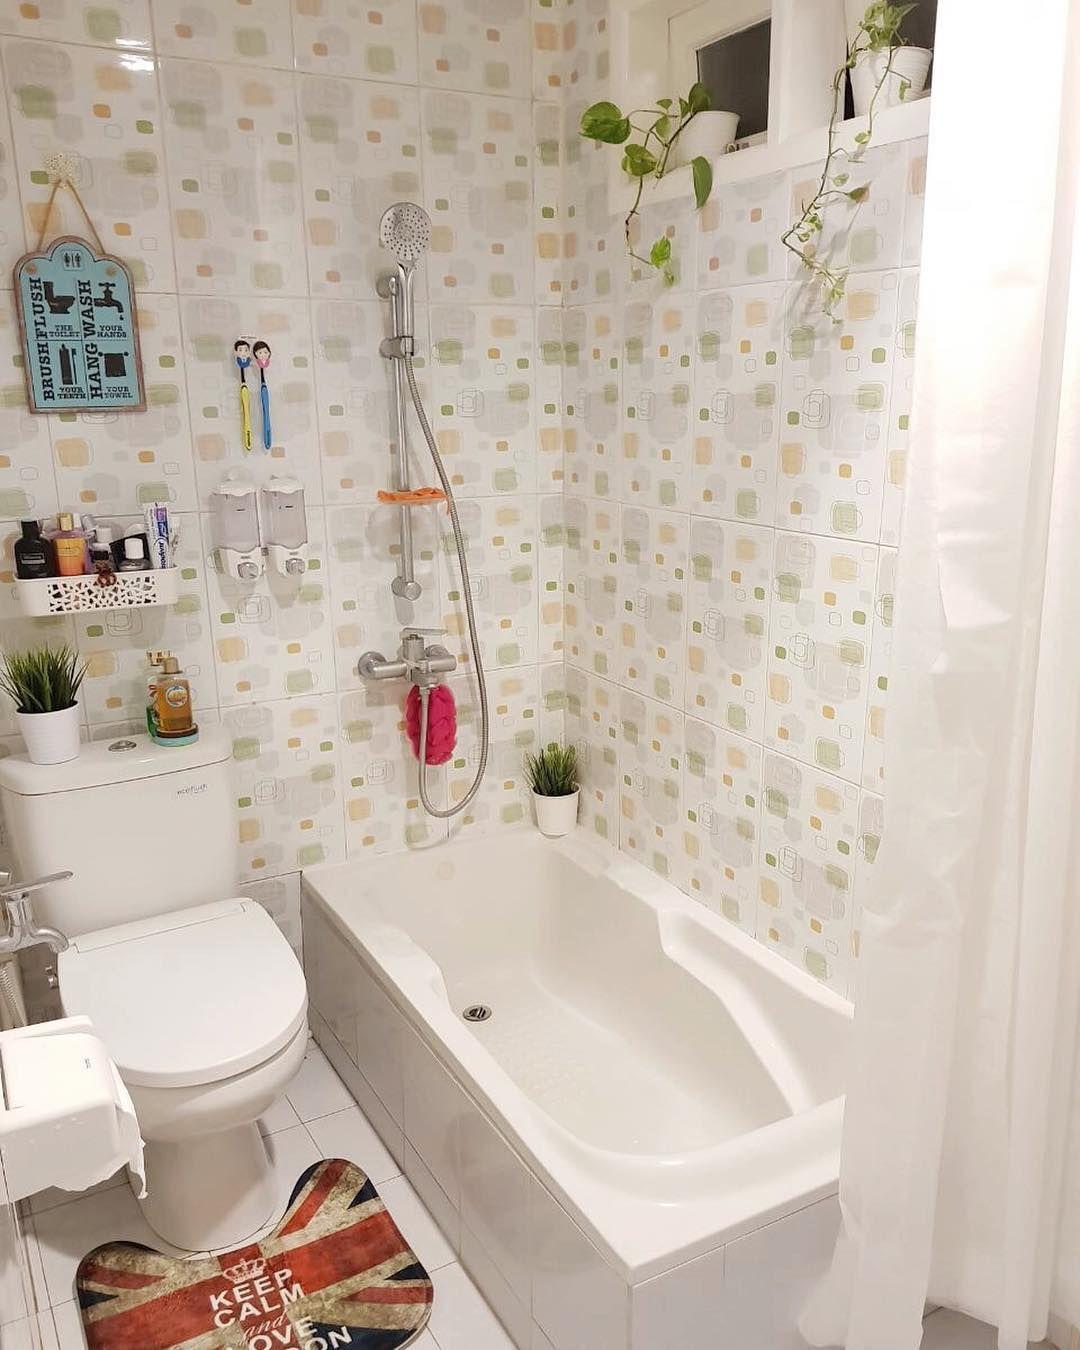 Pin oleh Ferdy Gunawan di Bathroom | Desain ruang keluarga ...